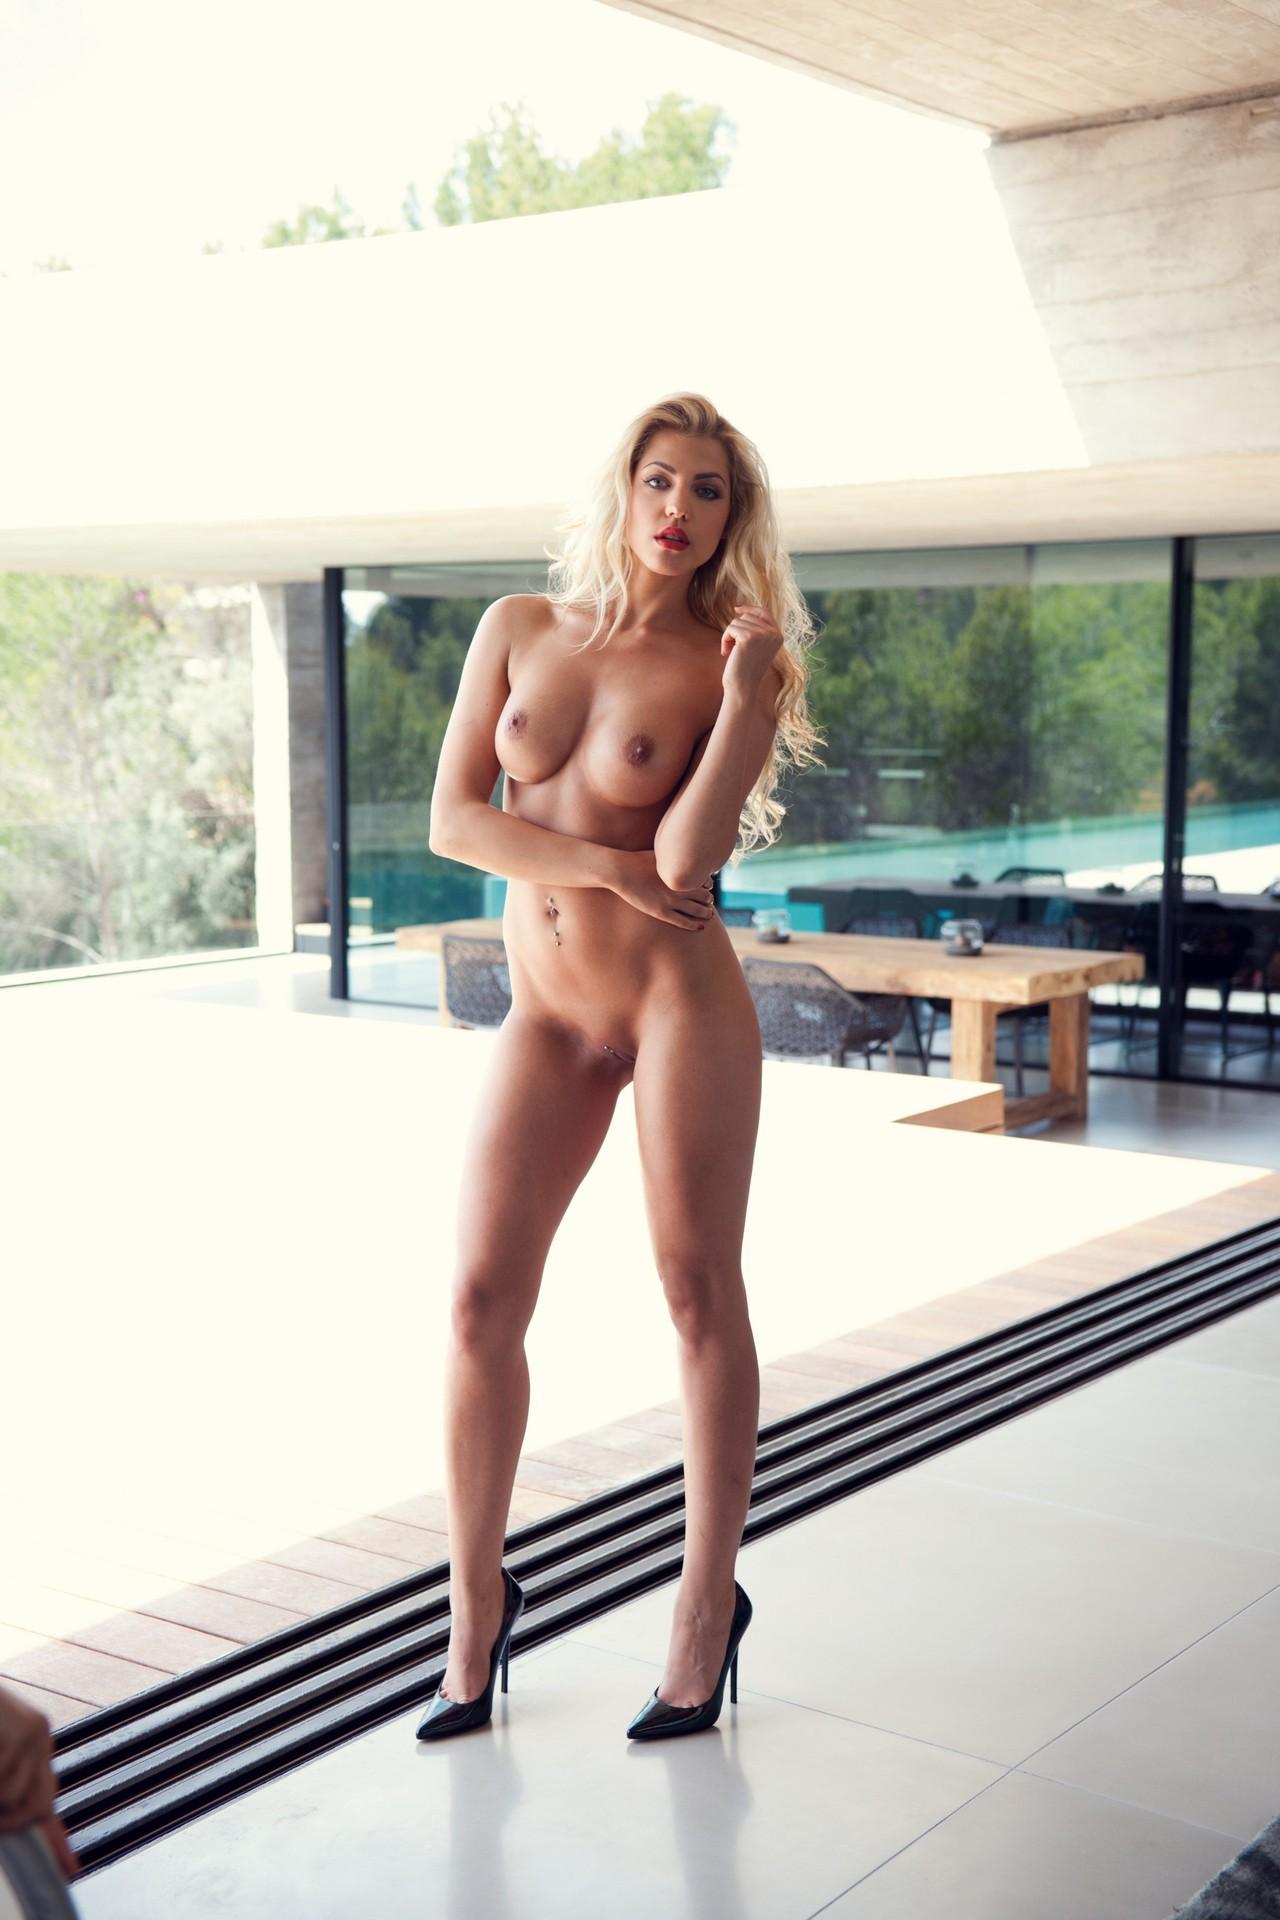 Nude playboy germany Playboy Germany: